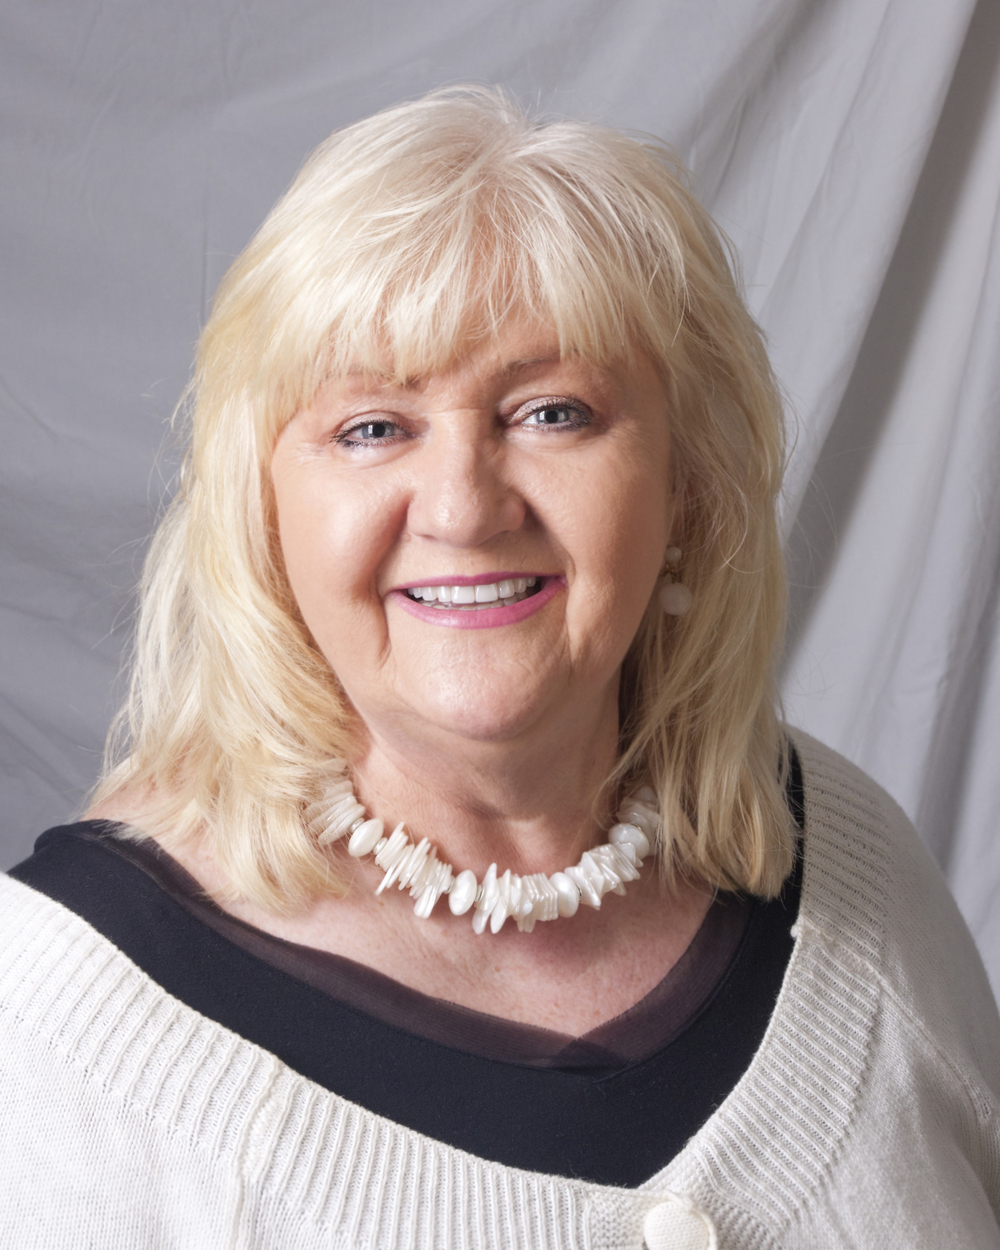 Teresa Koszykowski, jewelry artist